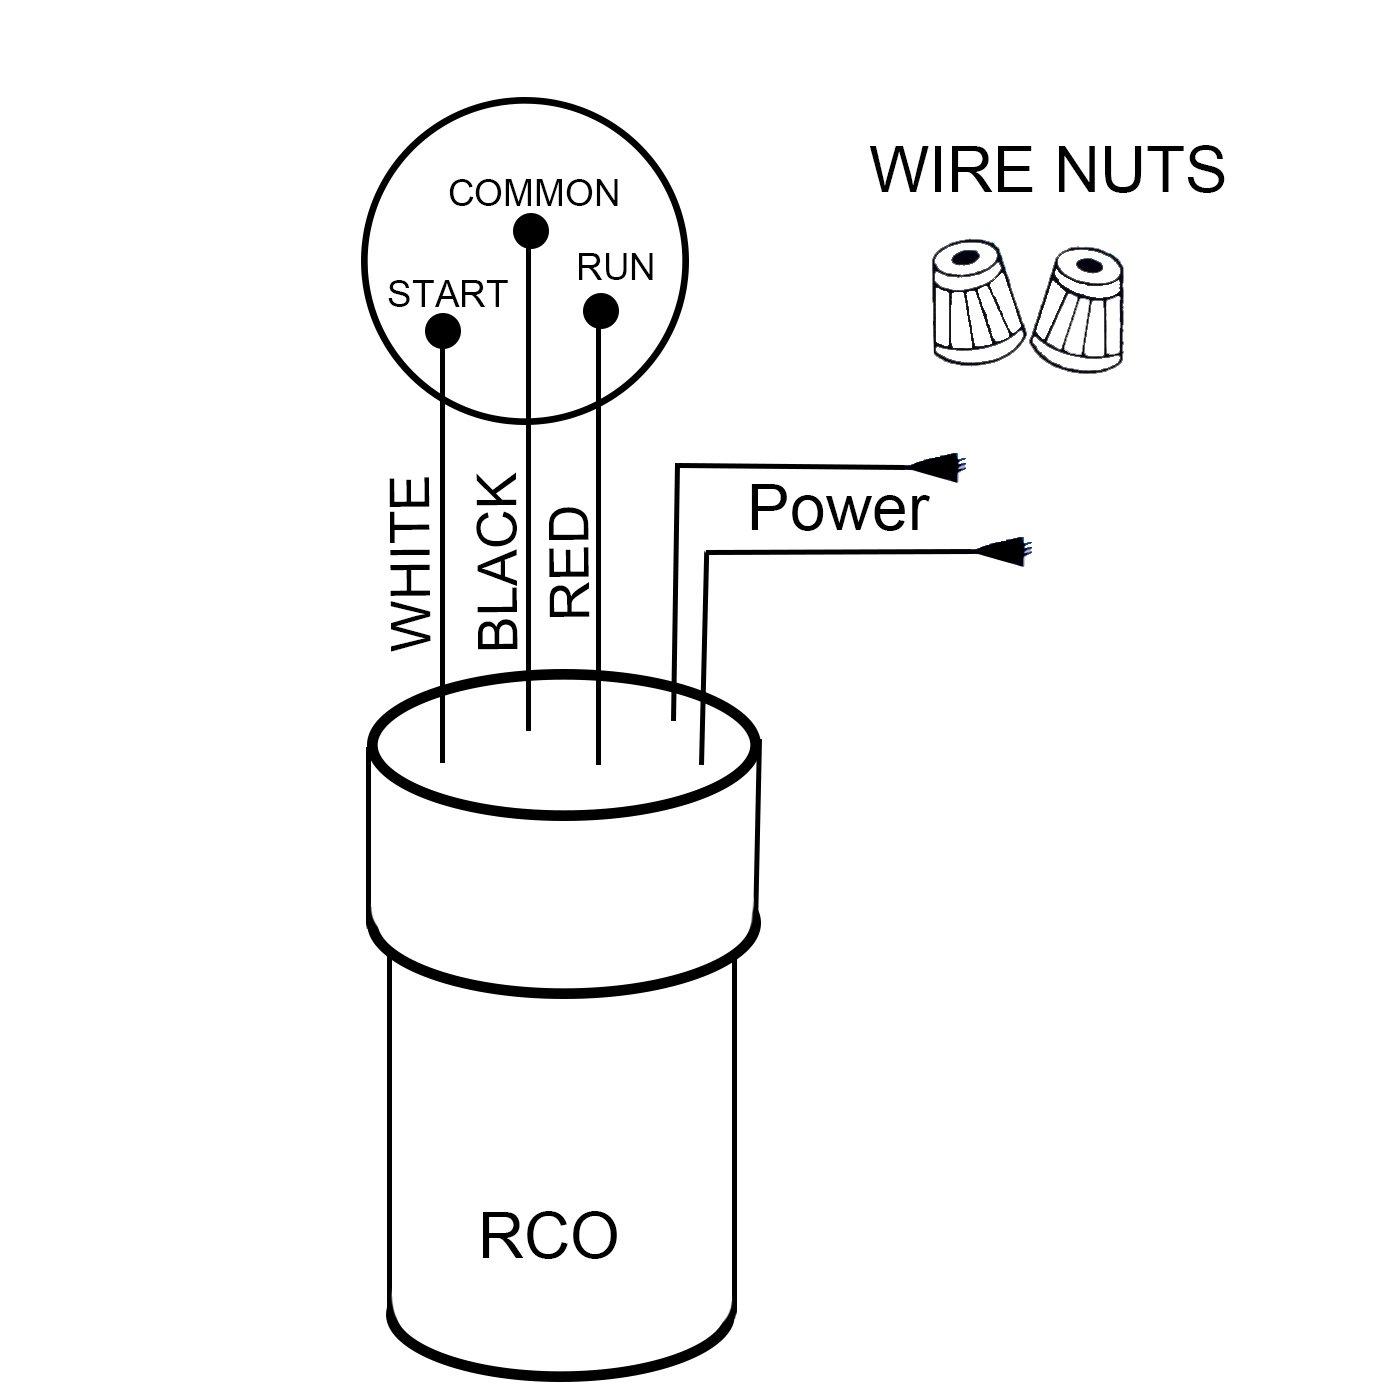 Nf 4860 Rco810 Wiring Diagram Wiring Diagram